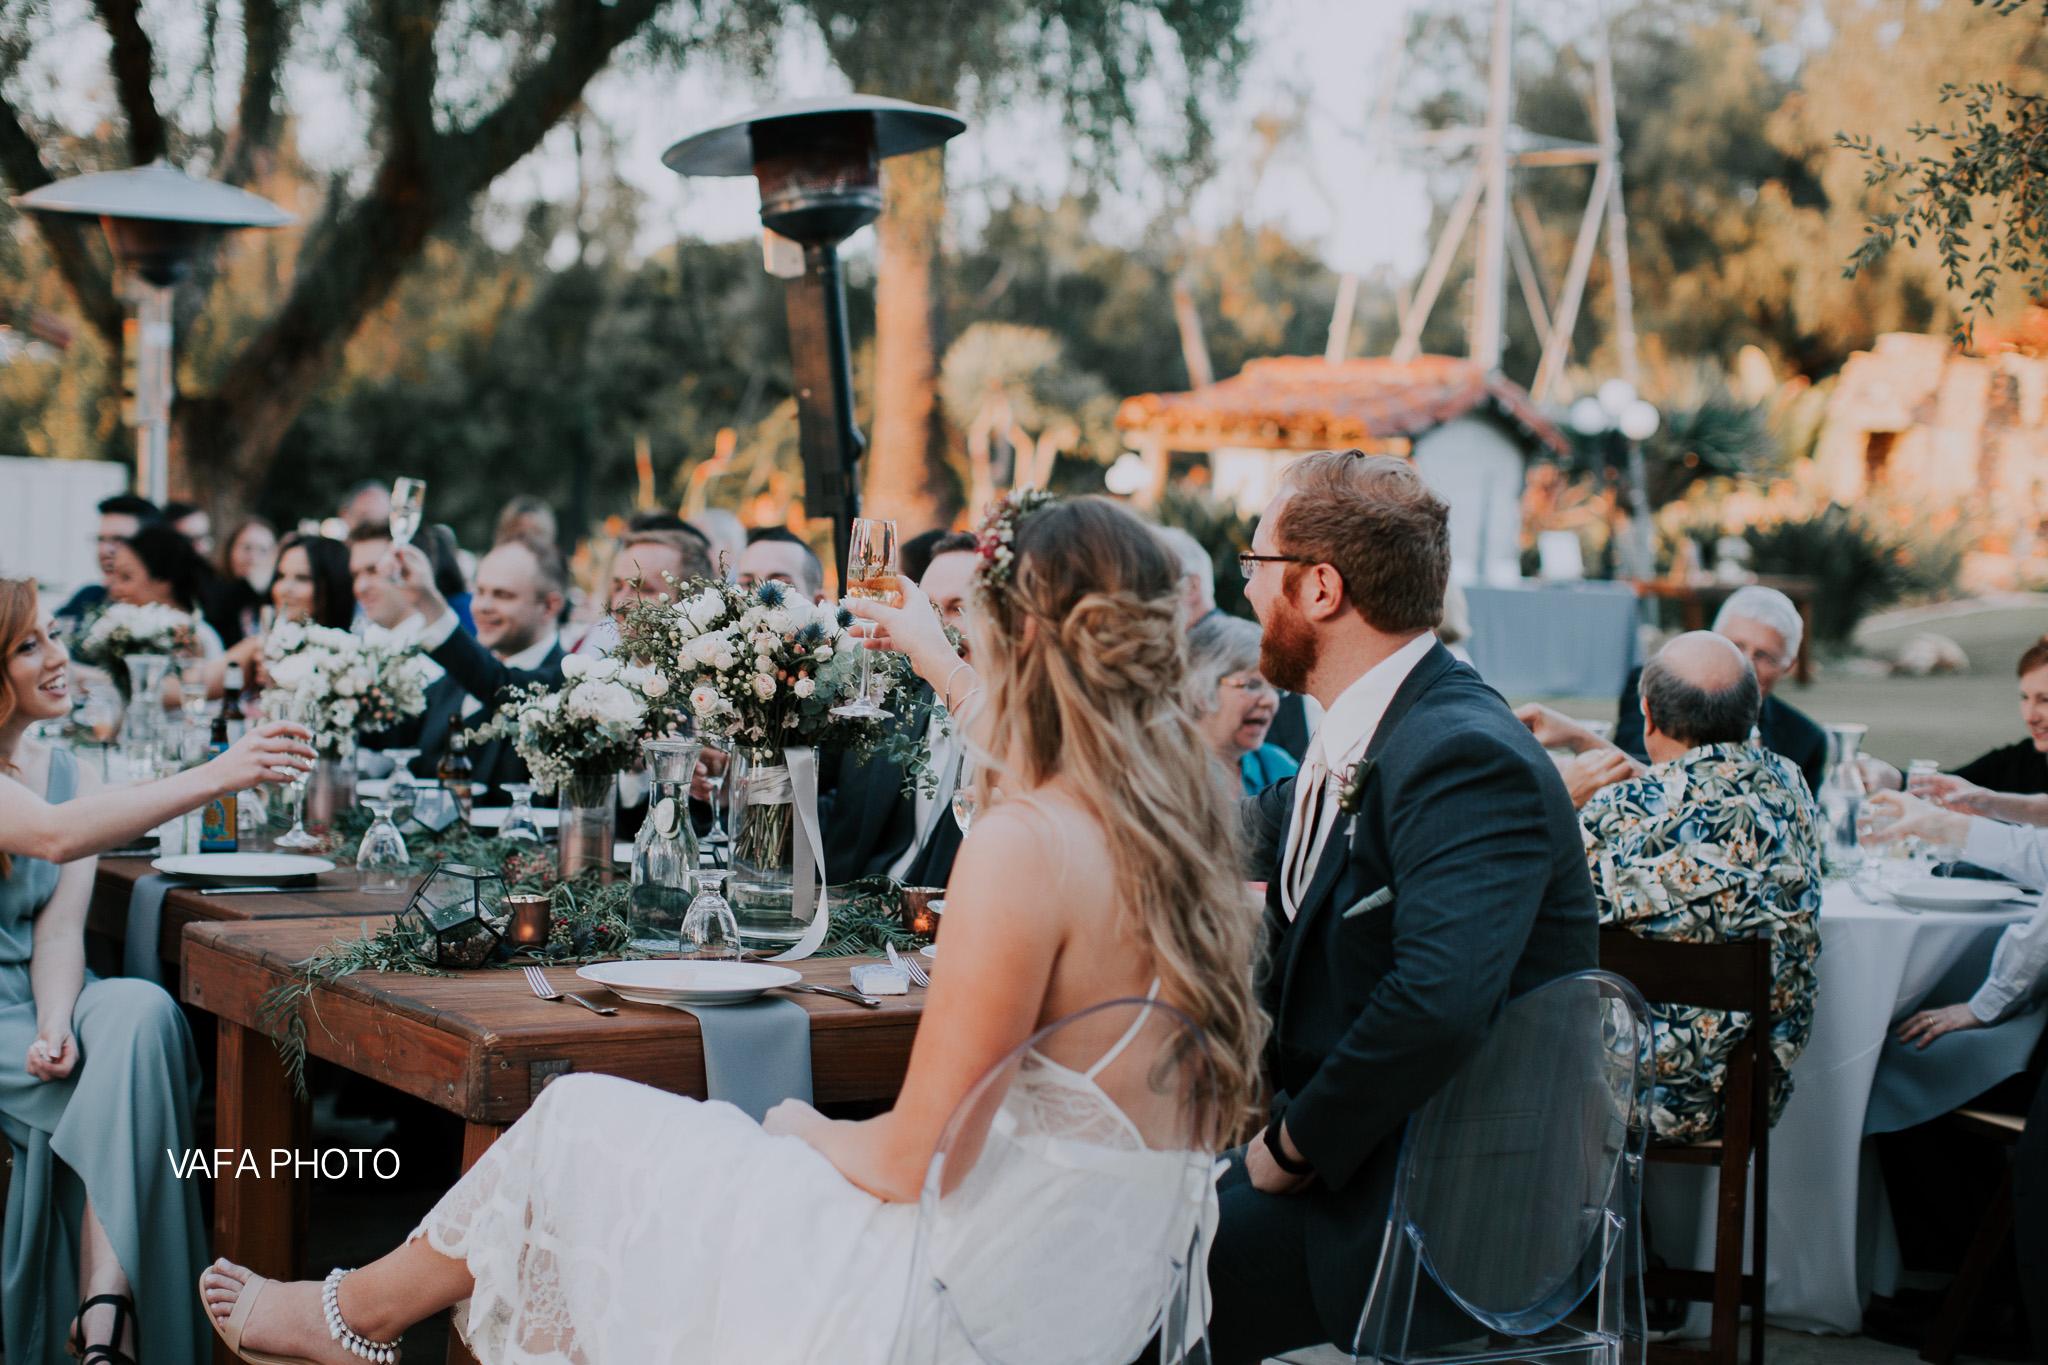 Leo-Carrillo-Ranch-Wedding-Lauren-Mike-Vafa-Photo-1010.jpg